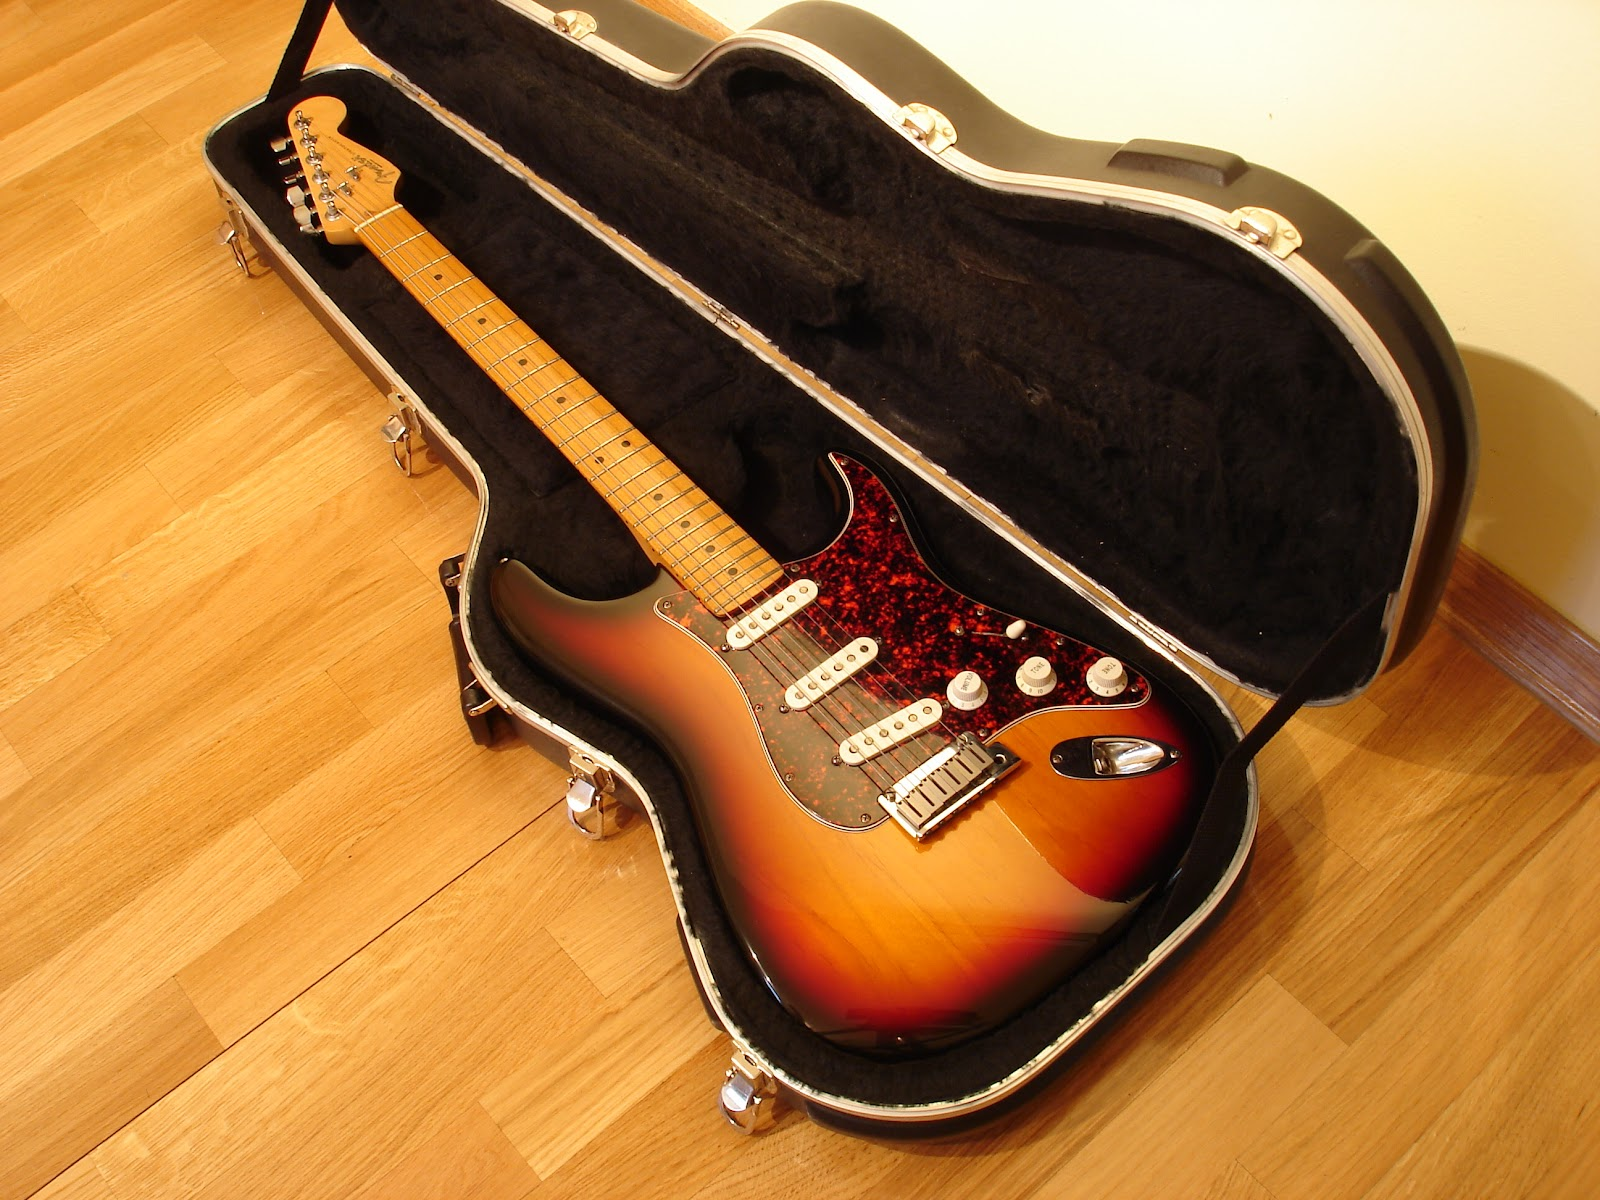 Fender Texas Special Vs Seymour Duncan Hot Rails Pickups